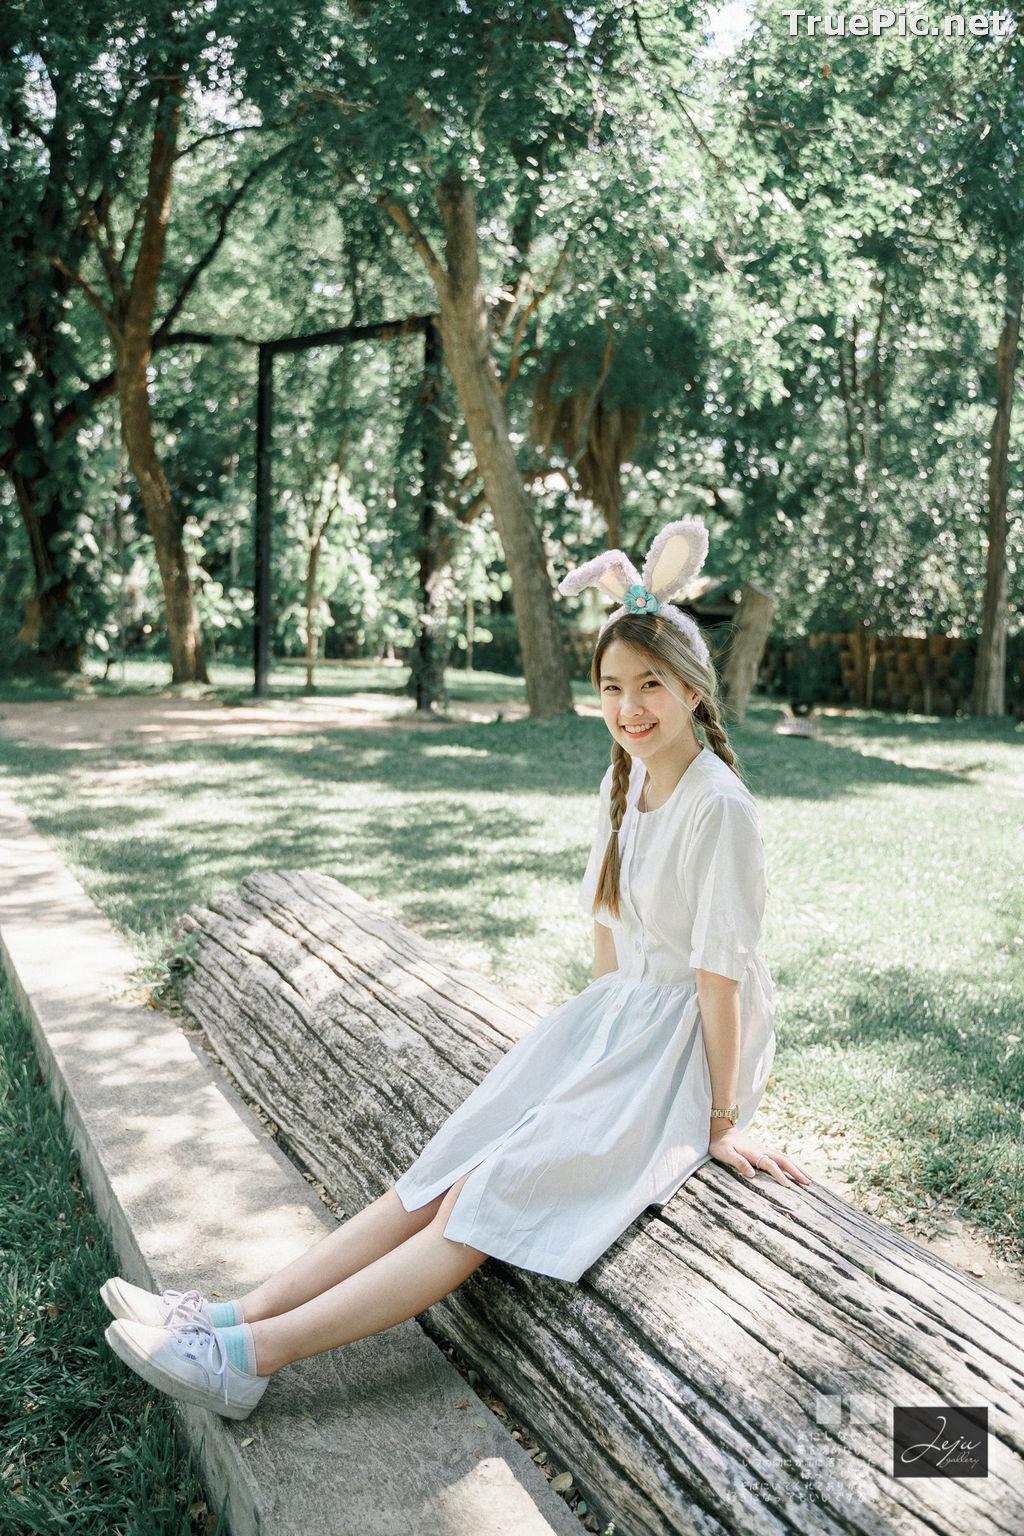 Image Thailand Cute Model - Napat Cdhg - Gam Bunny Girl - TruePic.net - Picture-5